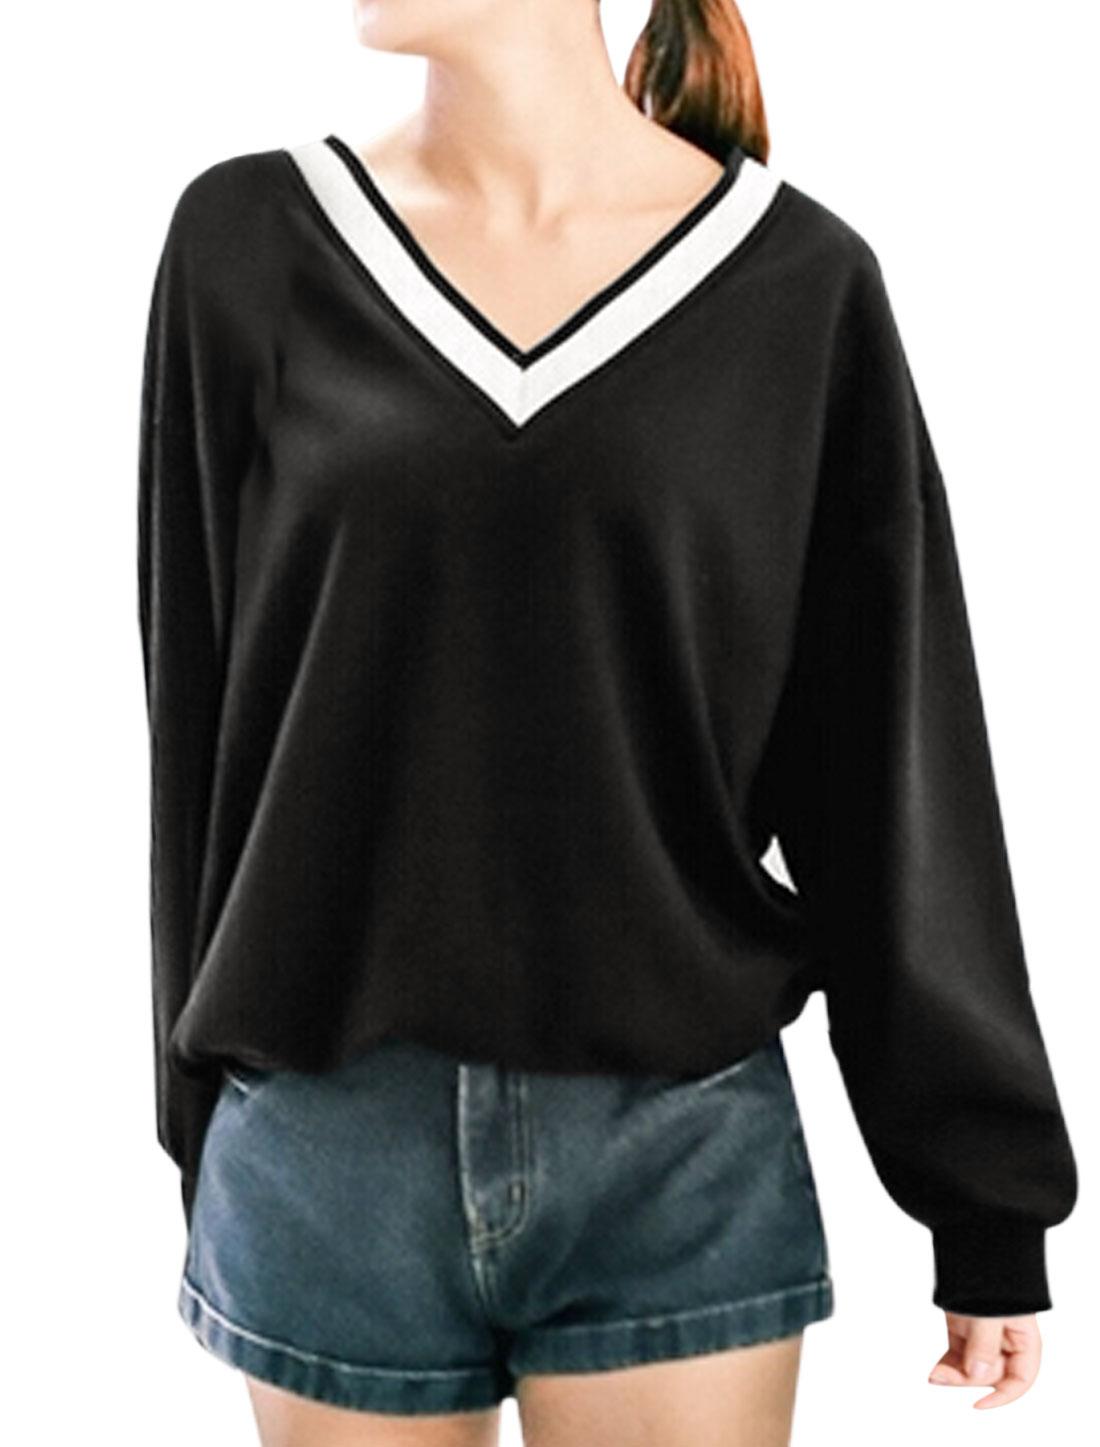 Women Knitted V Neckline Long Batwing Sleeves Drop Shoulder T-Shirt Black XS